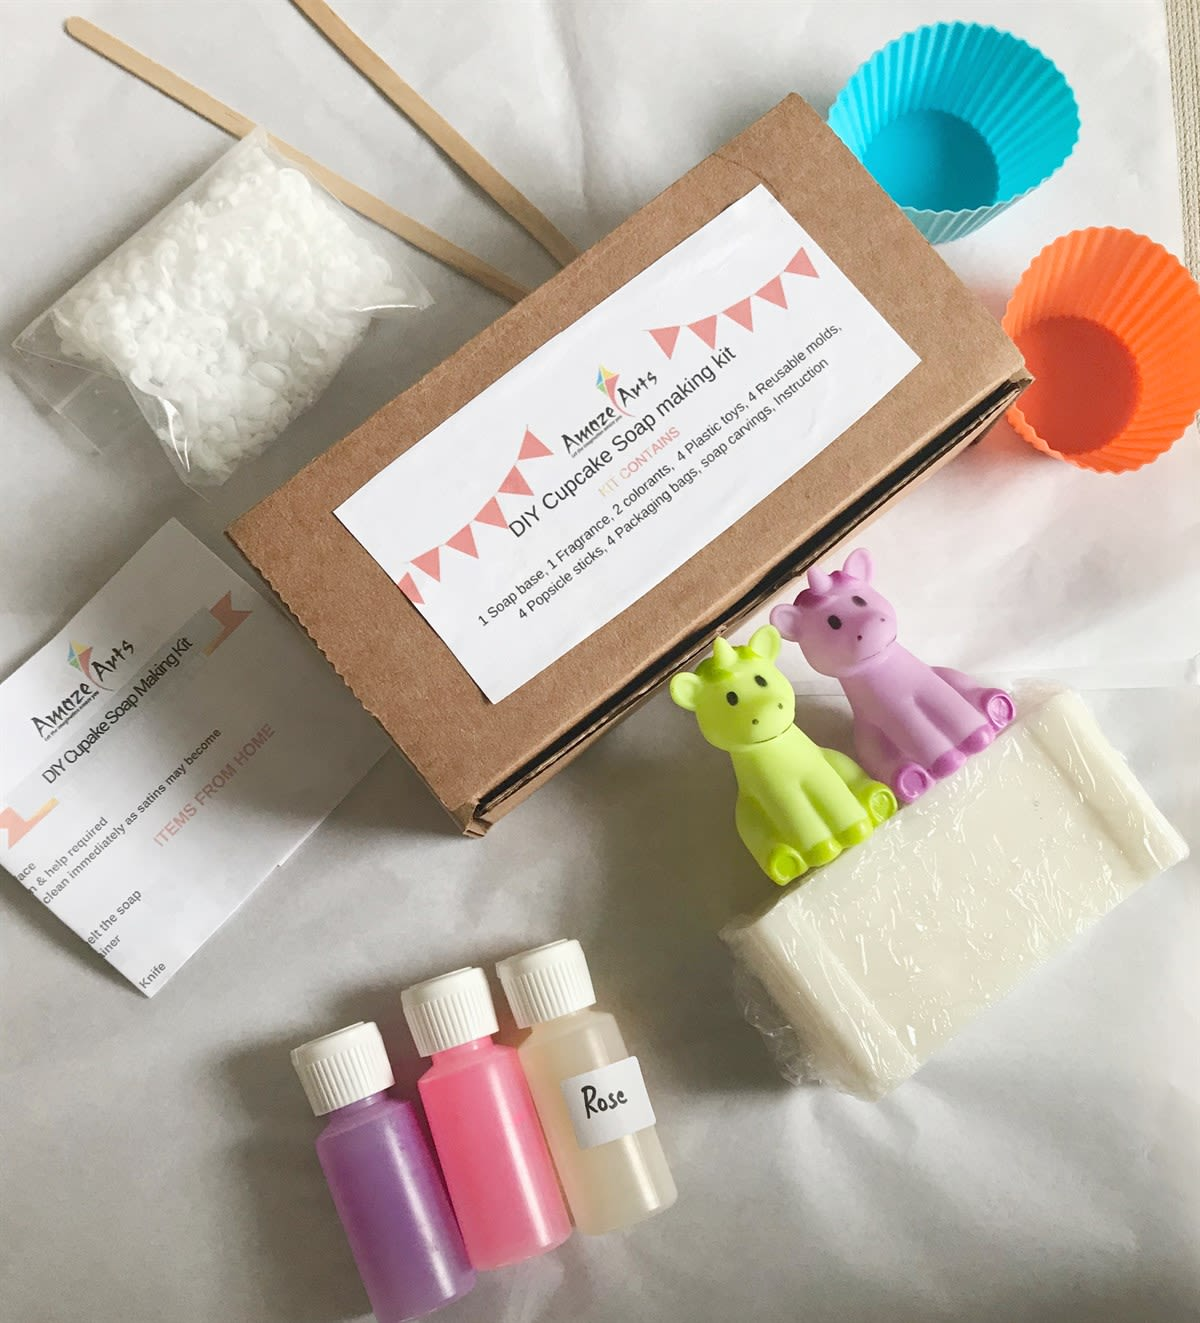 Diy Soap Making Kit Makes 2 Soaps Jane